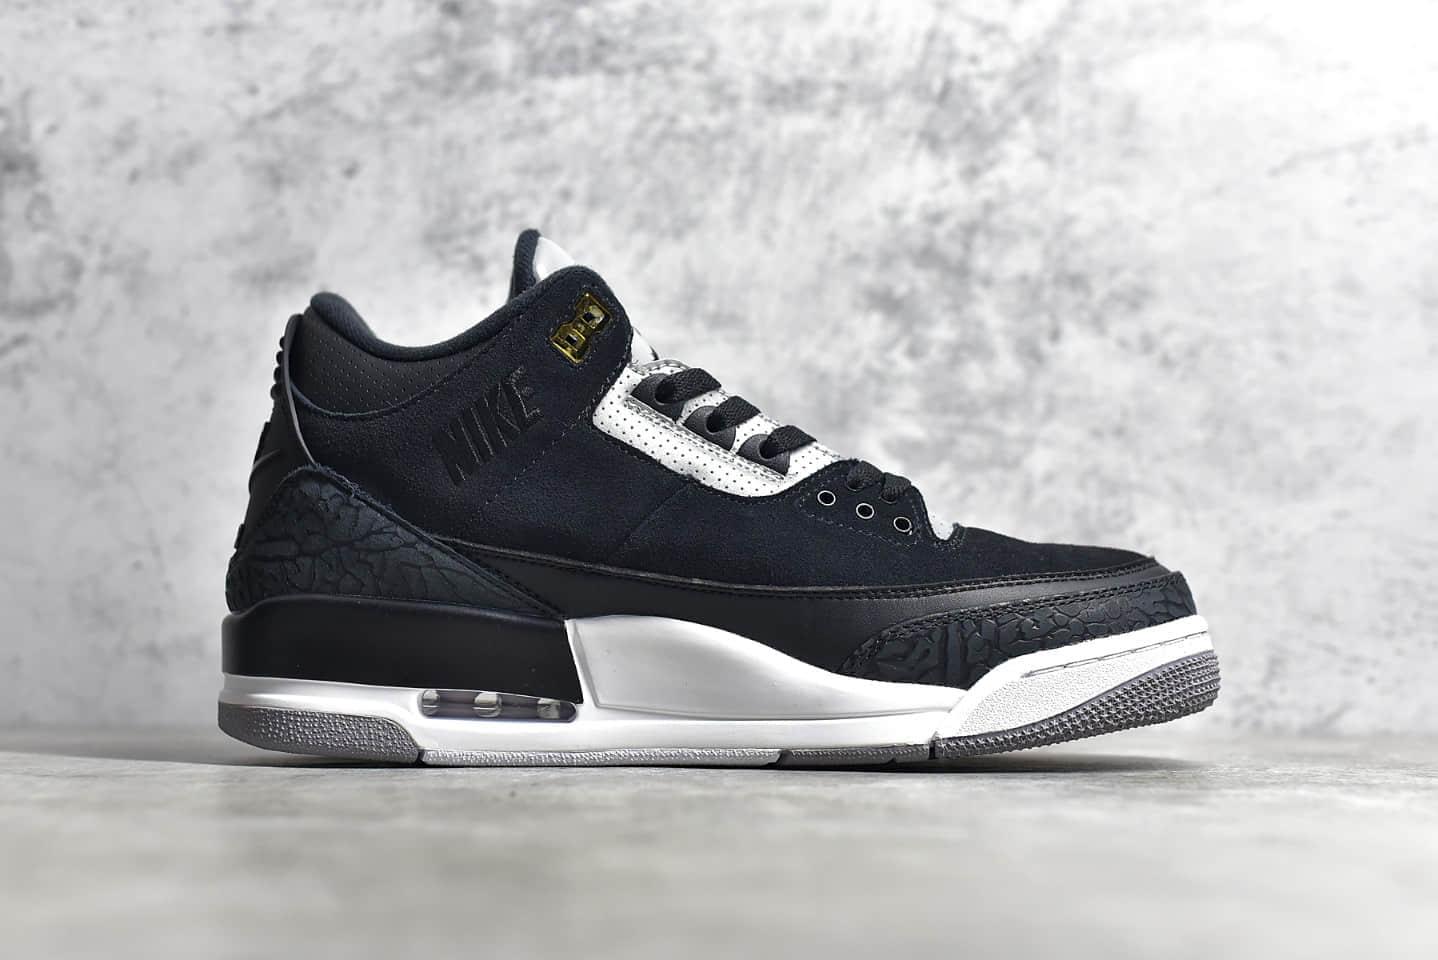 AJ3黑水泥反光实战球鞋 Air Jordan 3 Retro Tinker 银灰 3M 反光鞋舌原厂AJ3复古球鞋 货号:CK4348-007-潮流者之家